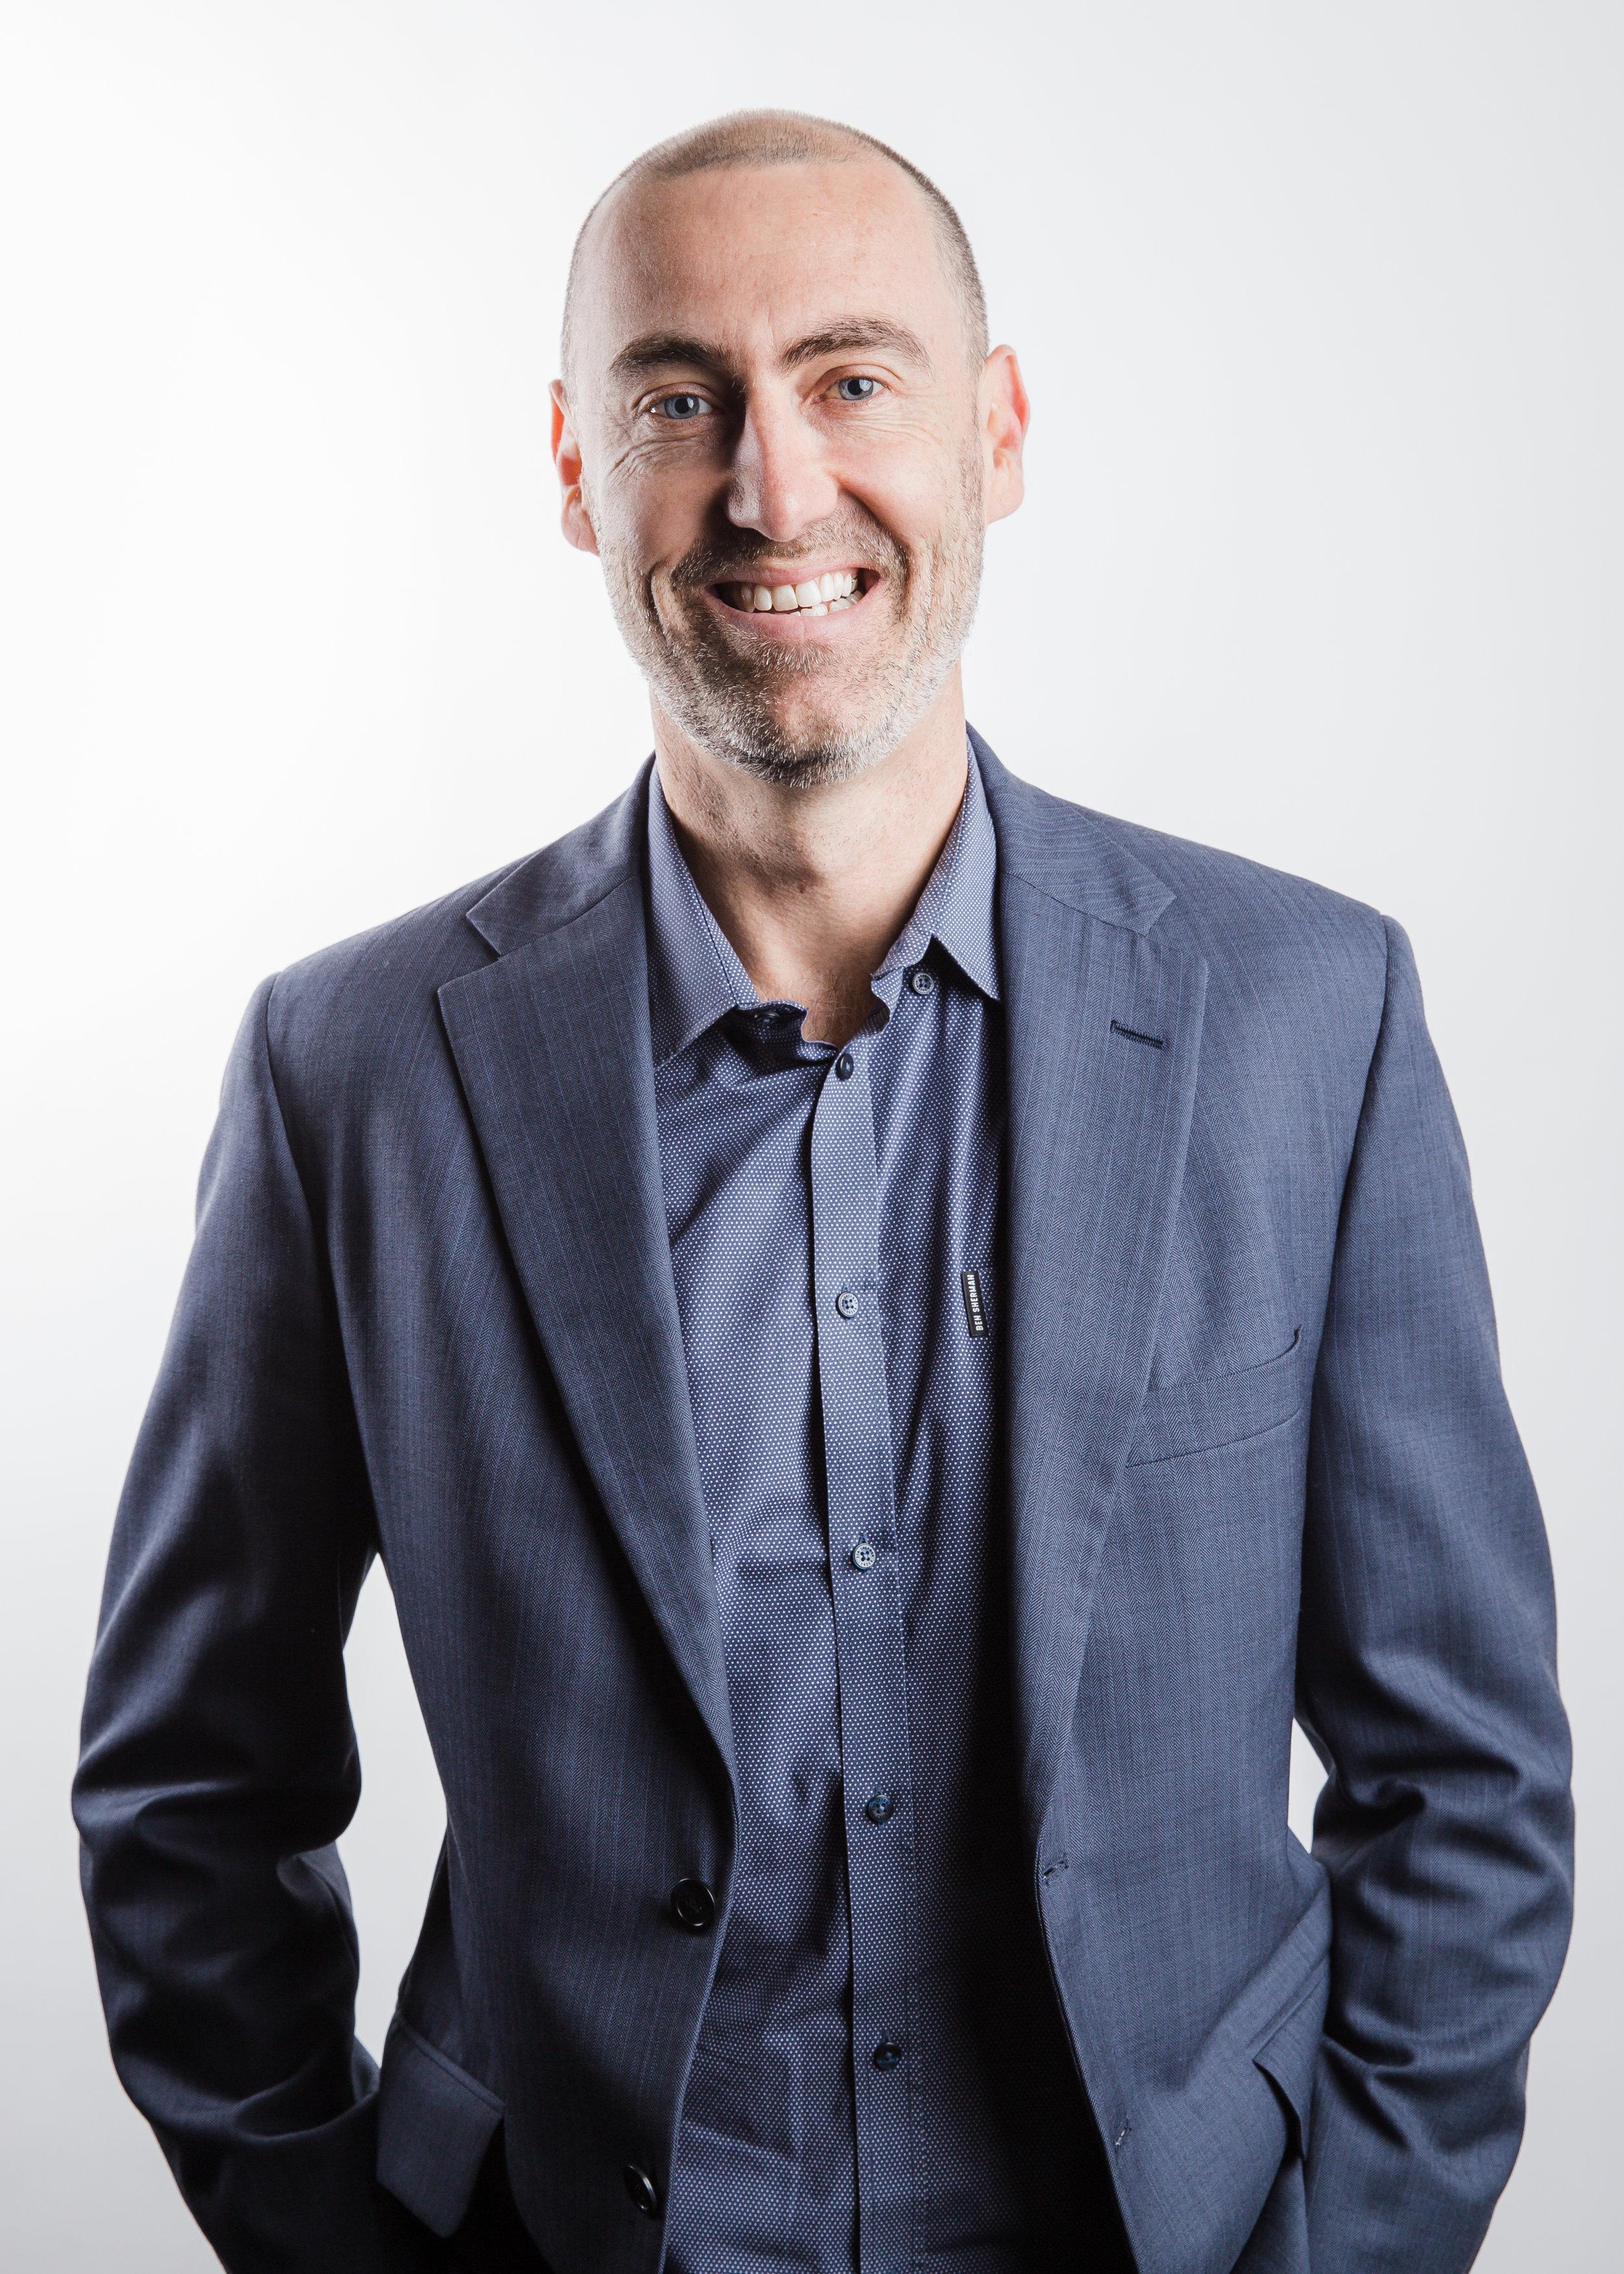 David Johnston – Founder and Managing Director